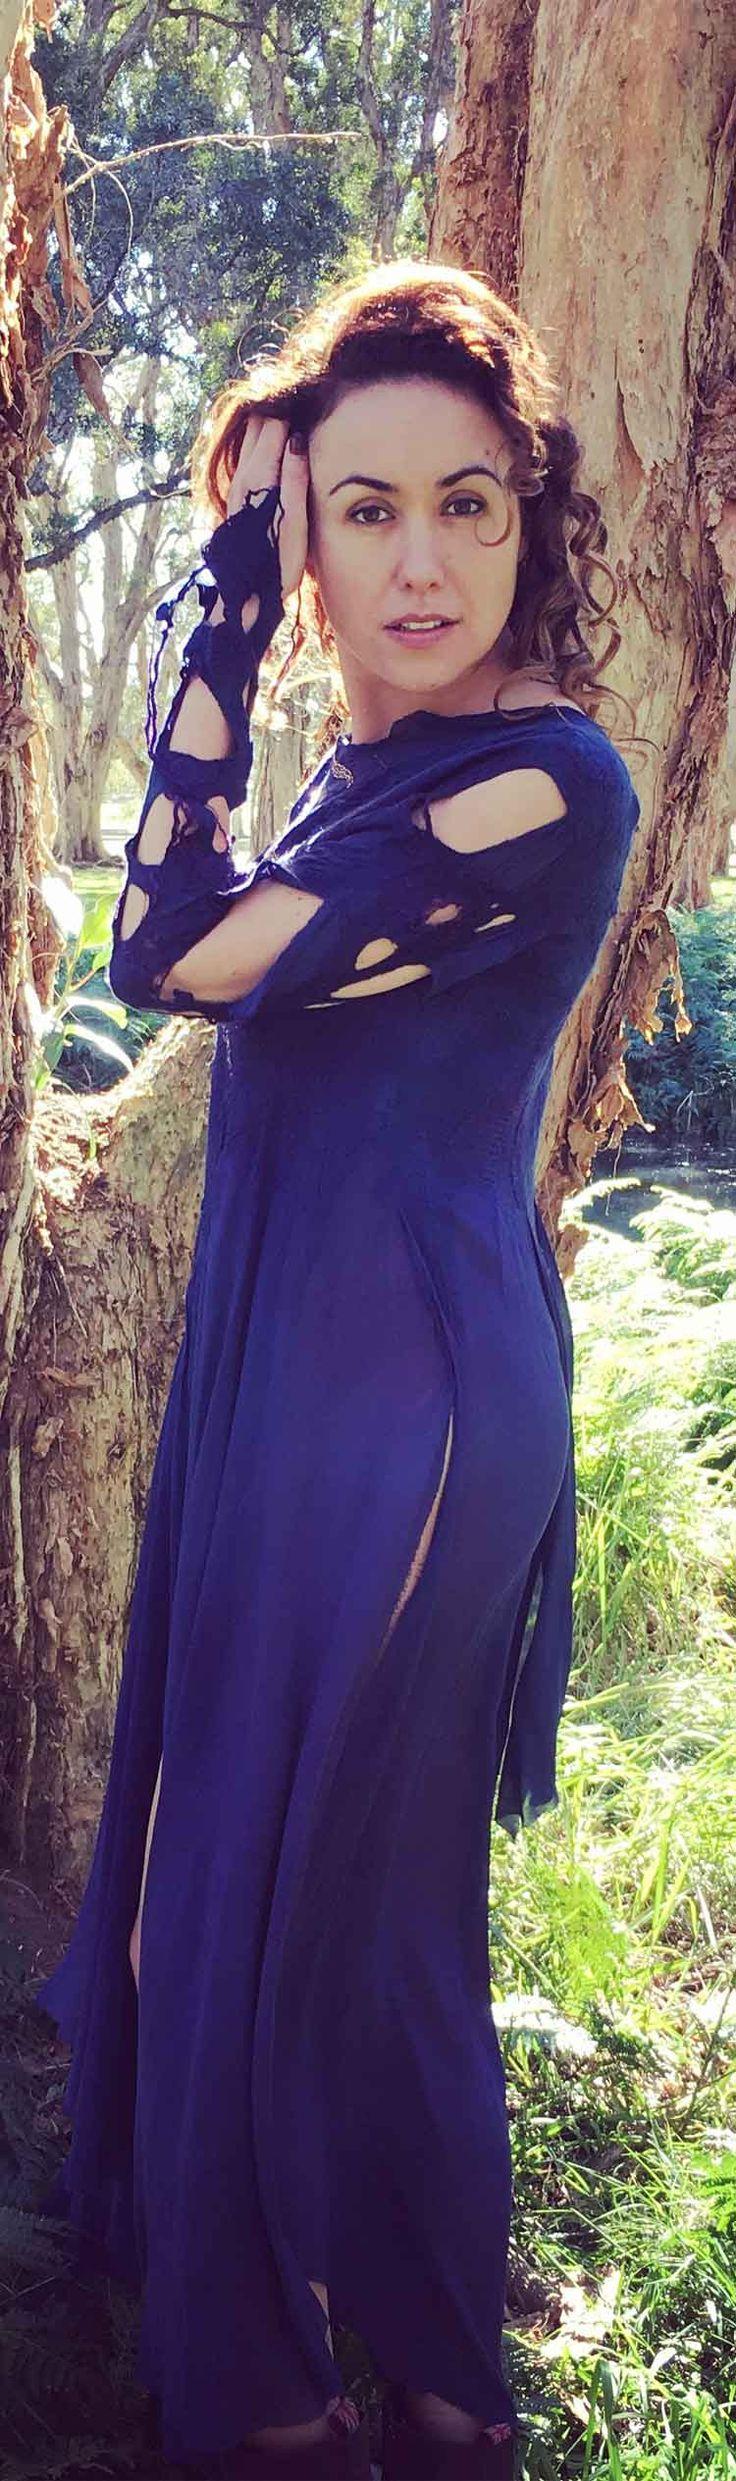 Beautiful fashion nuno wool felted dress by Vera Alexanderova#felt #felted #fashion #style #violet #purple #womenclothing #eco #ecofashion #boho #bohostyle #handmade #handmaddress #greenjacket #bohochic #silkdress #womendress